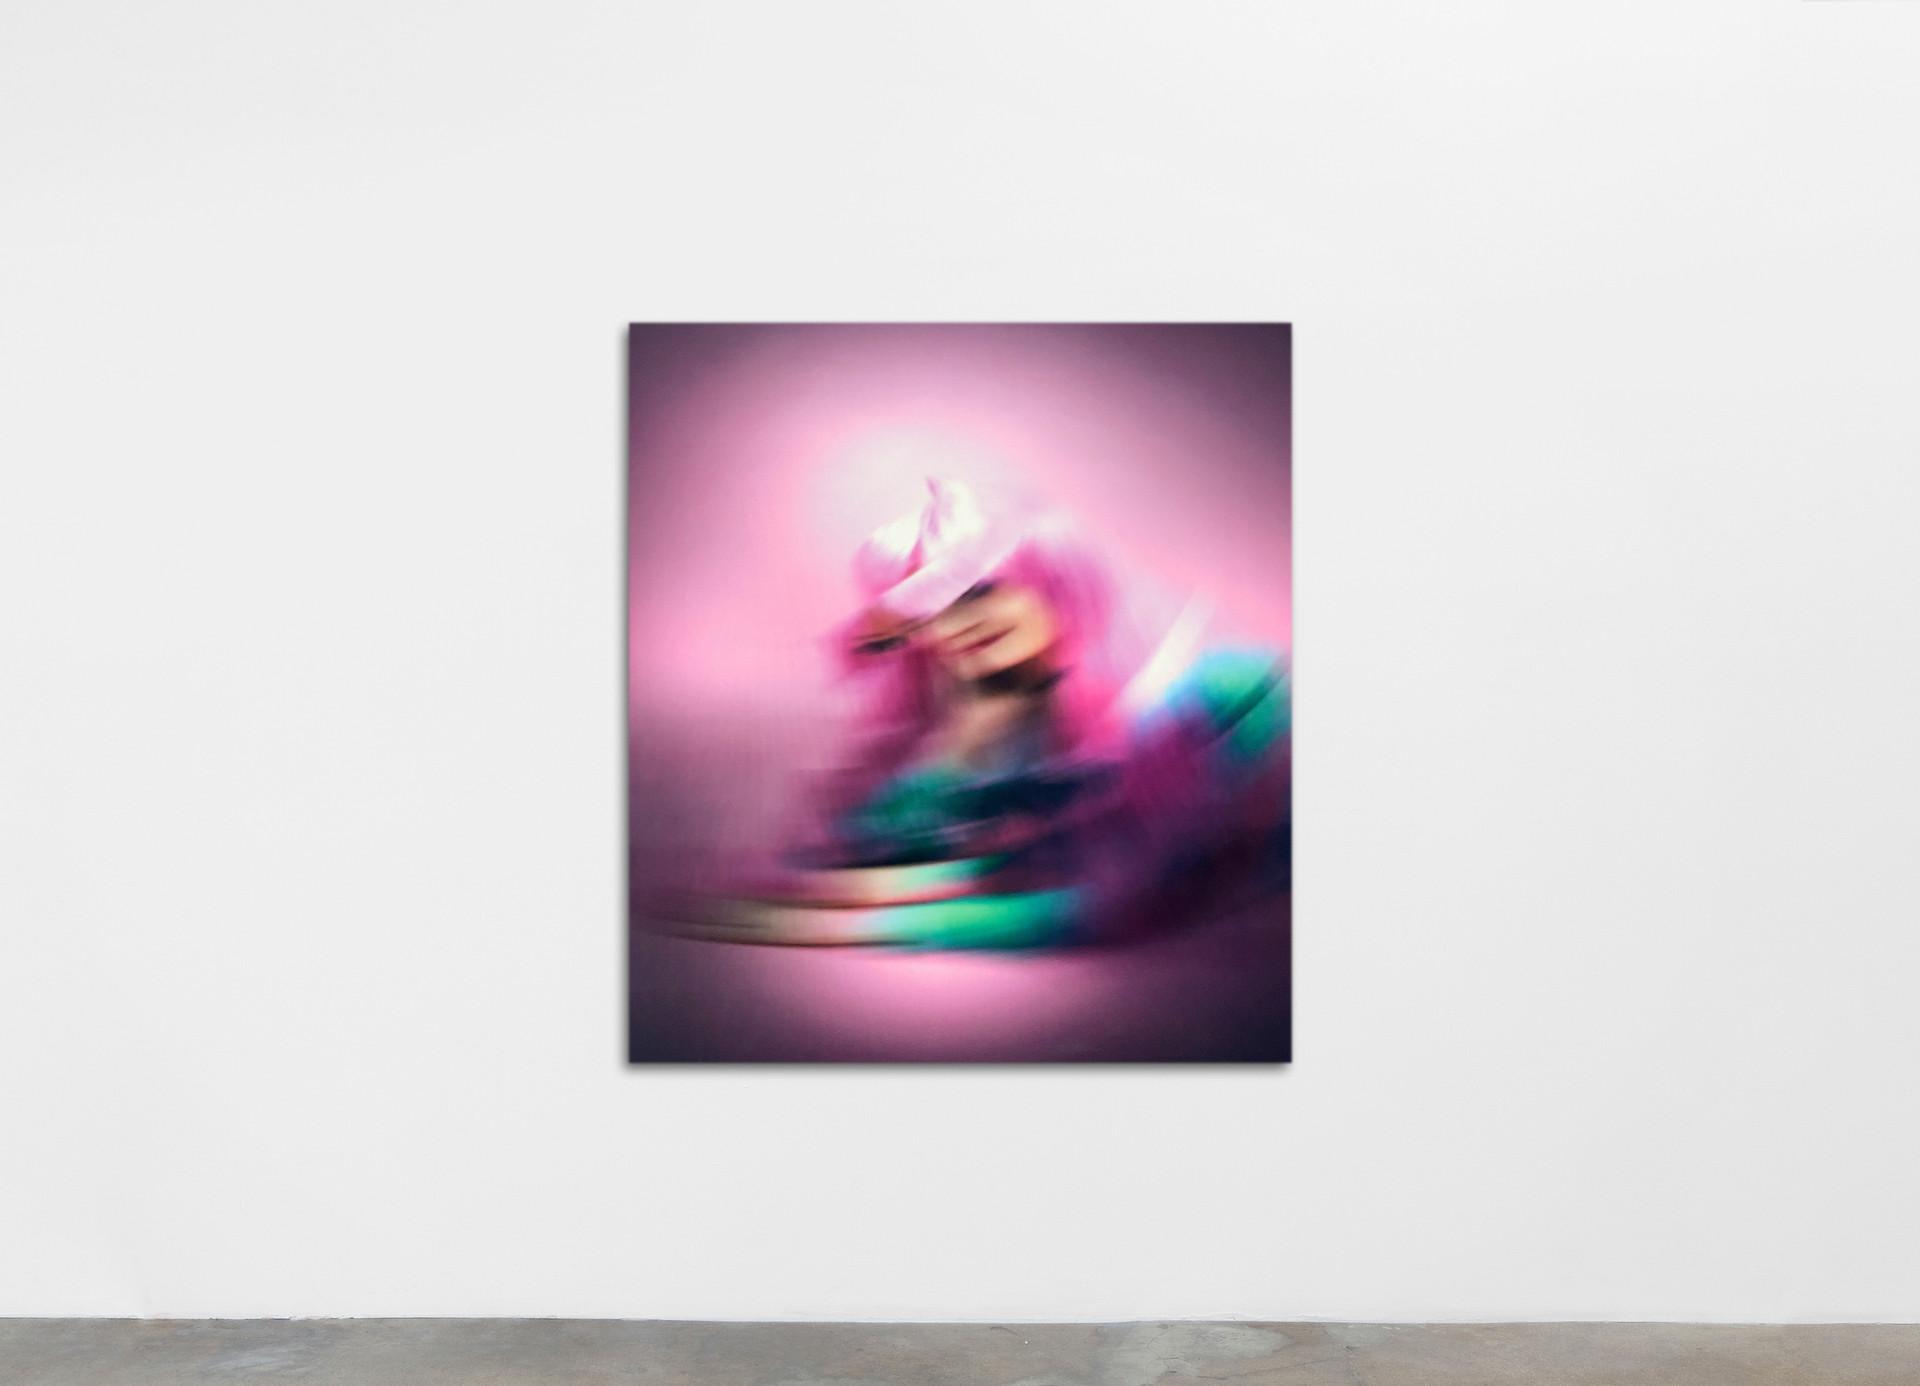 Ry David Bradley -YaT@0, 2020 Dye Transfer on Velvet 120 x 130 cm 47 1/4 x 51 1/8 in